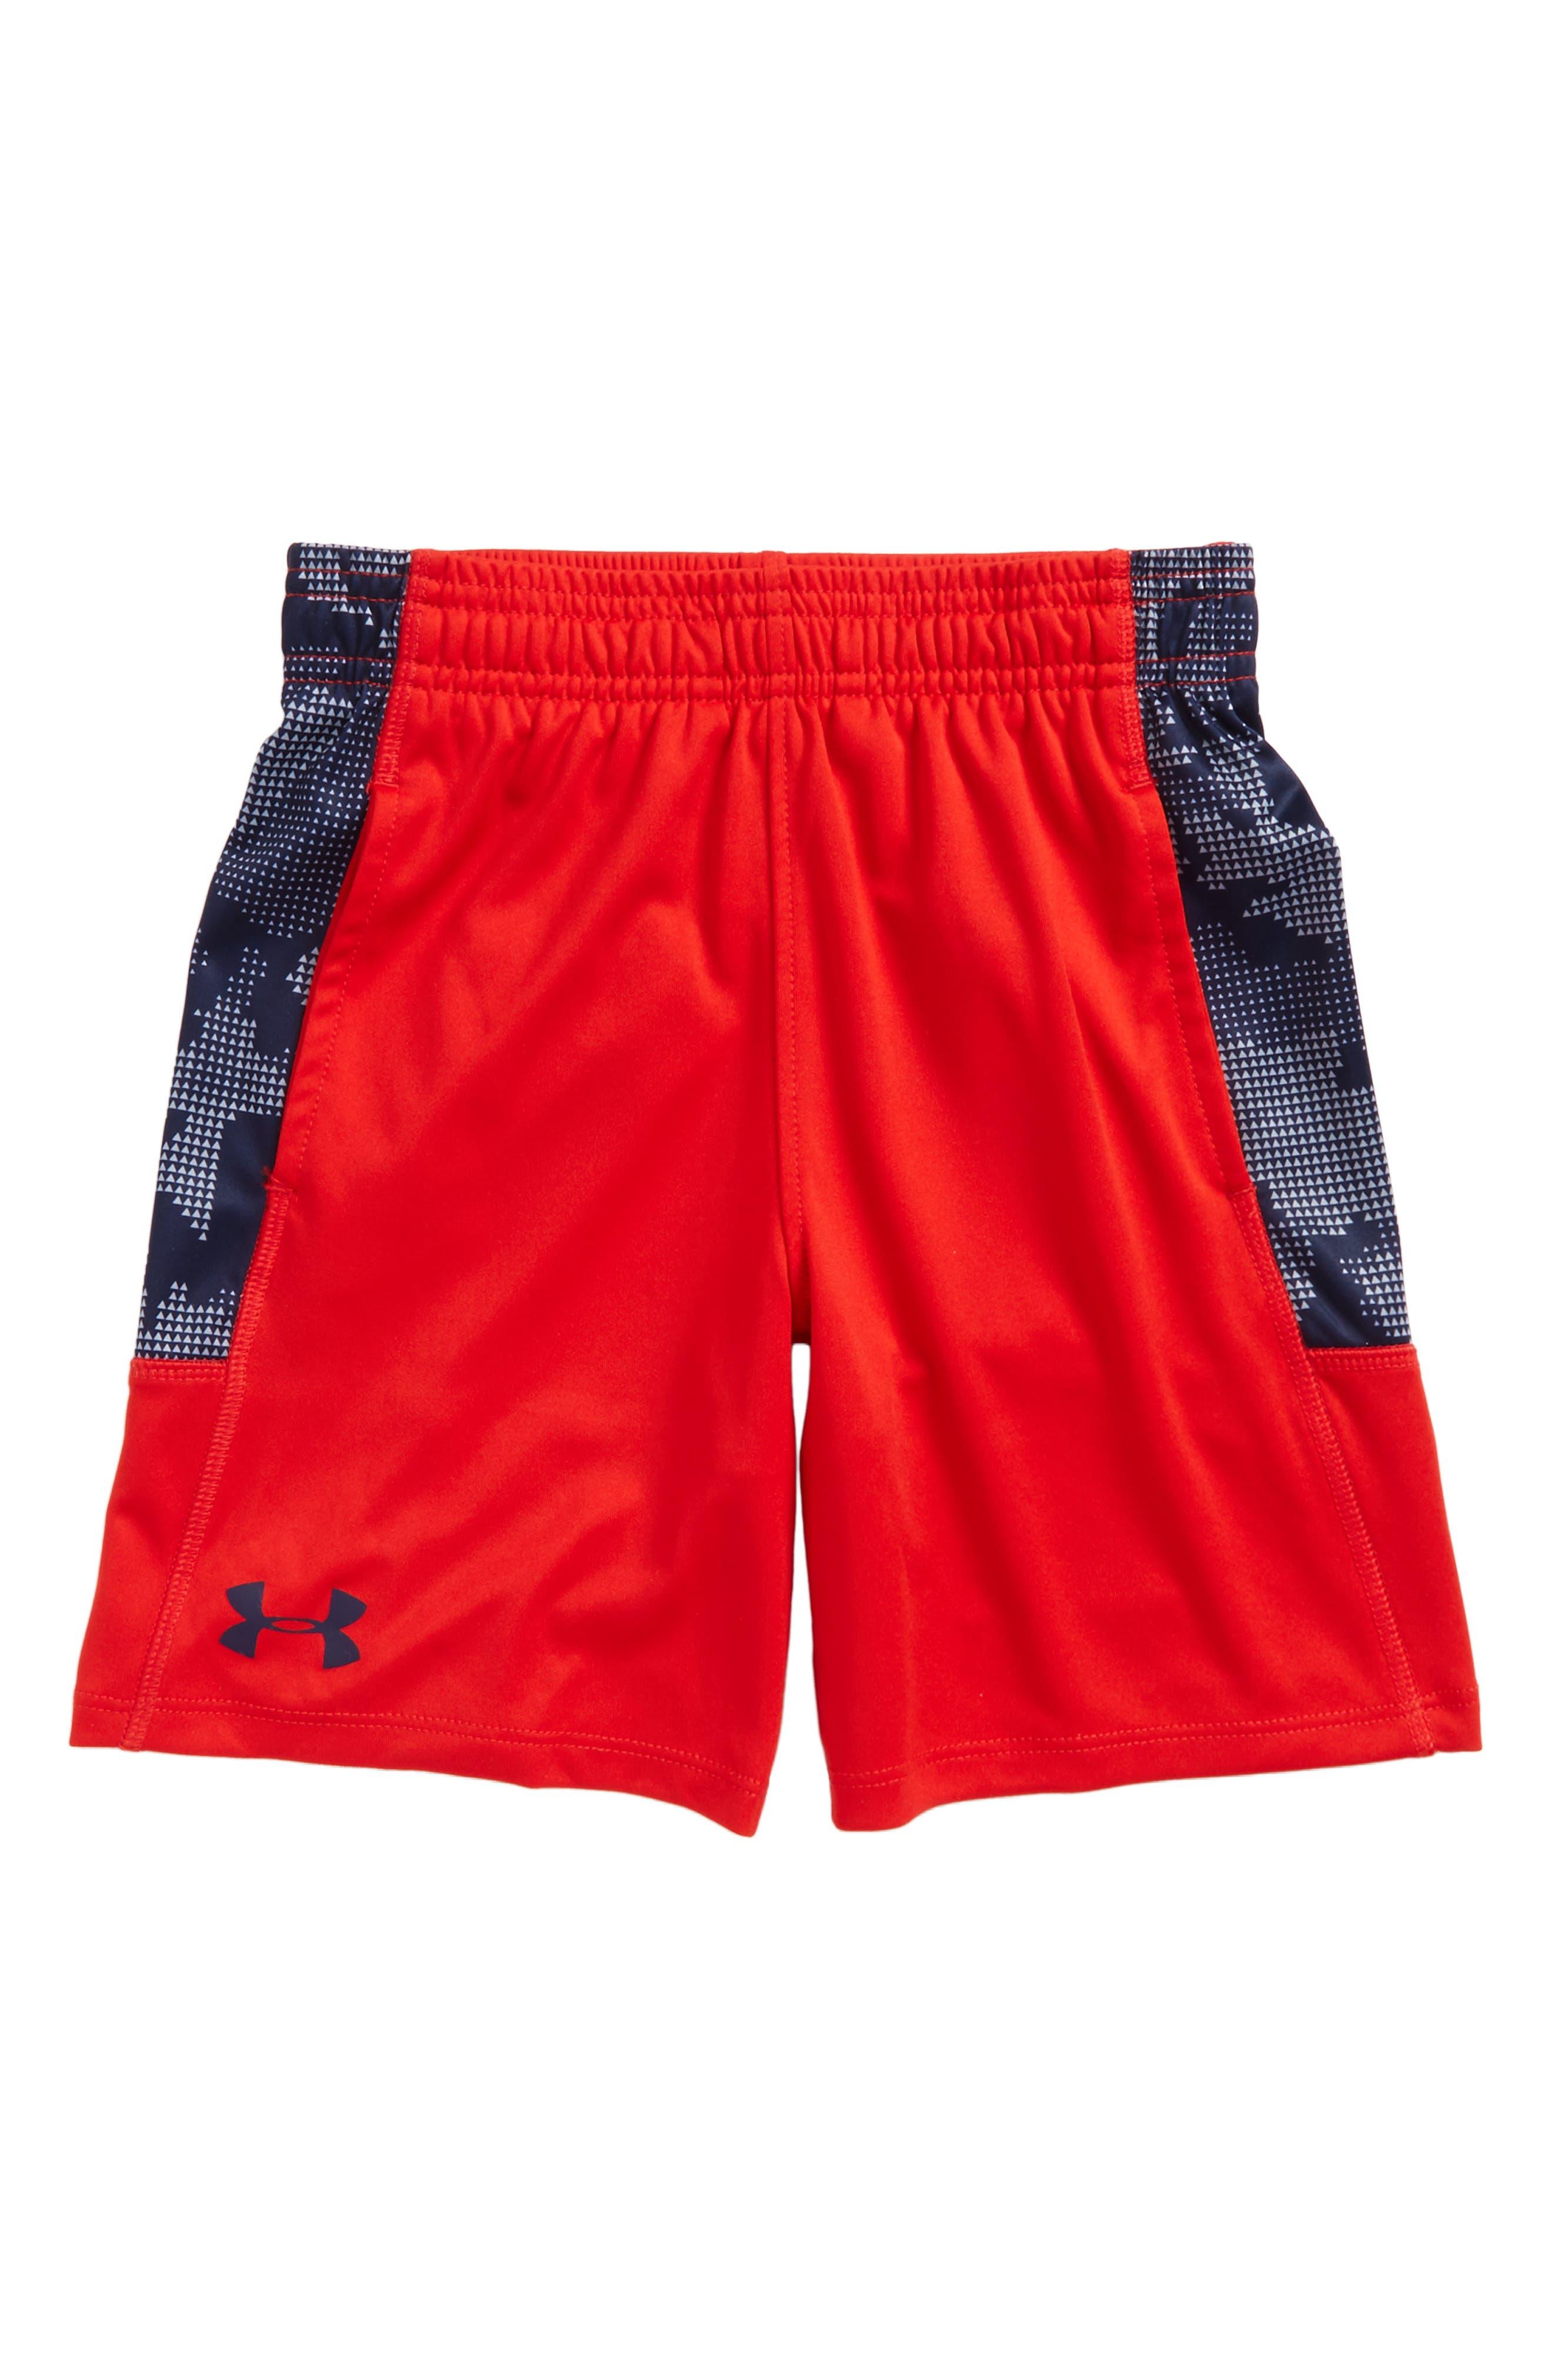 Utility Camo Stunt Athletic Shorts,                             Main thumbnail 1, color,